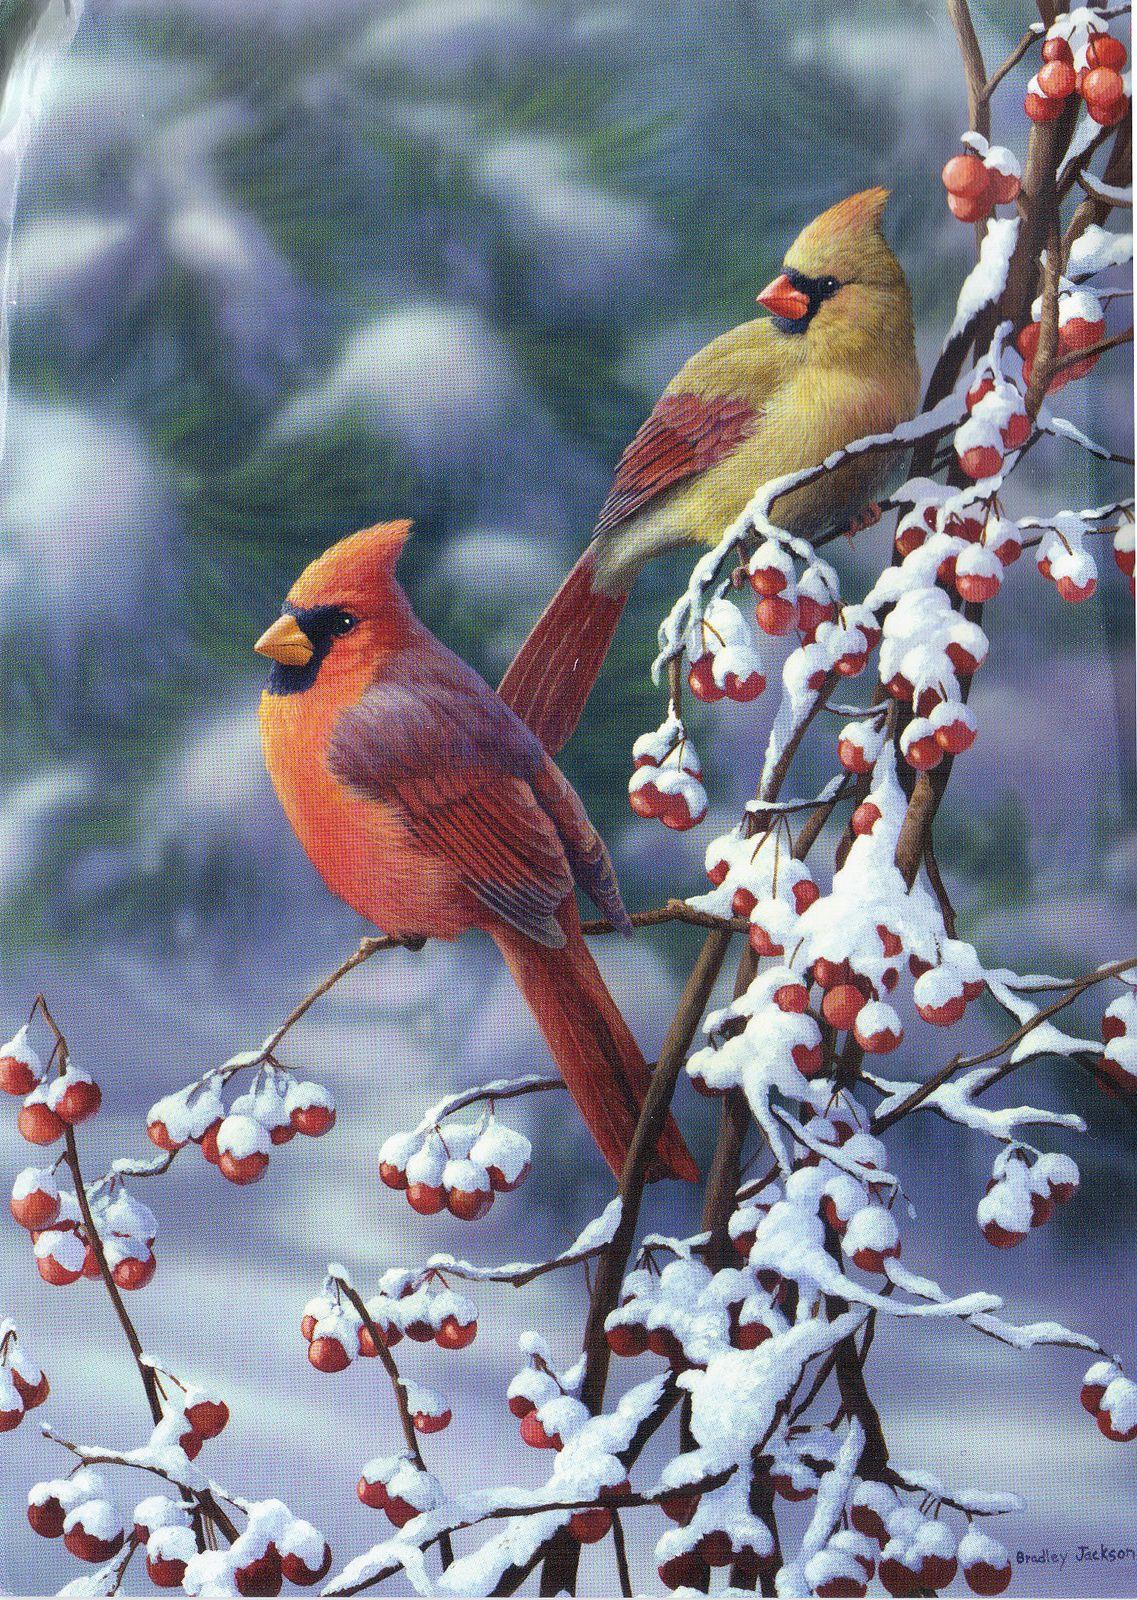 Christmas card usa beautiful birds winter scene